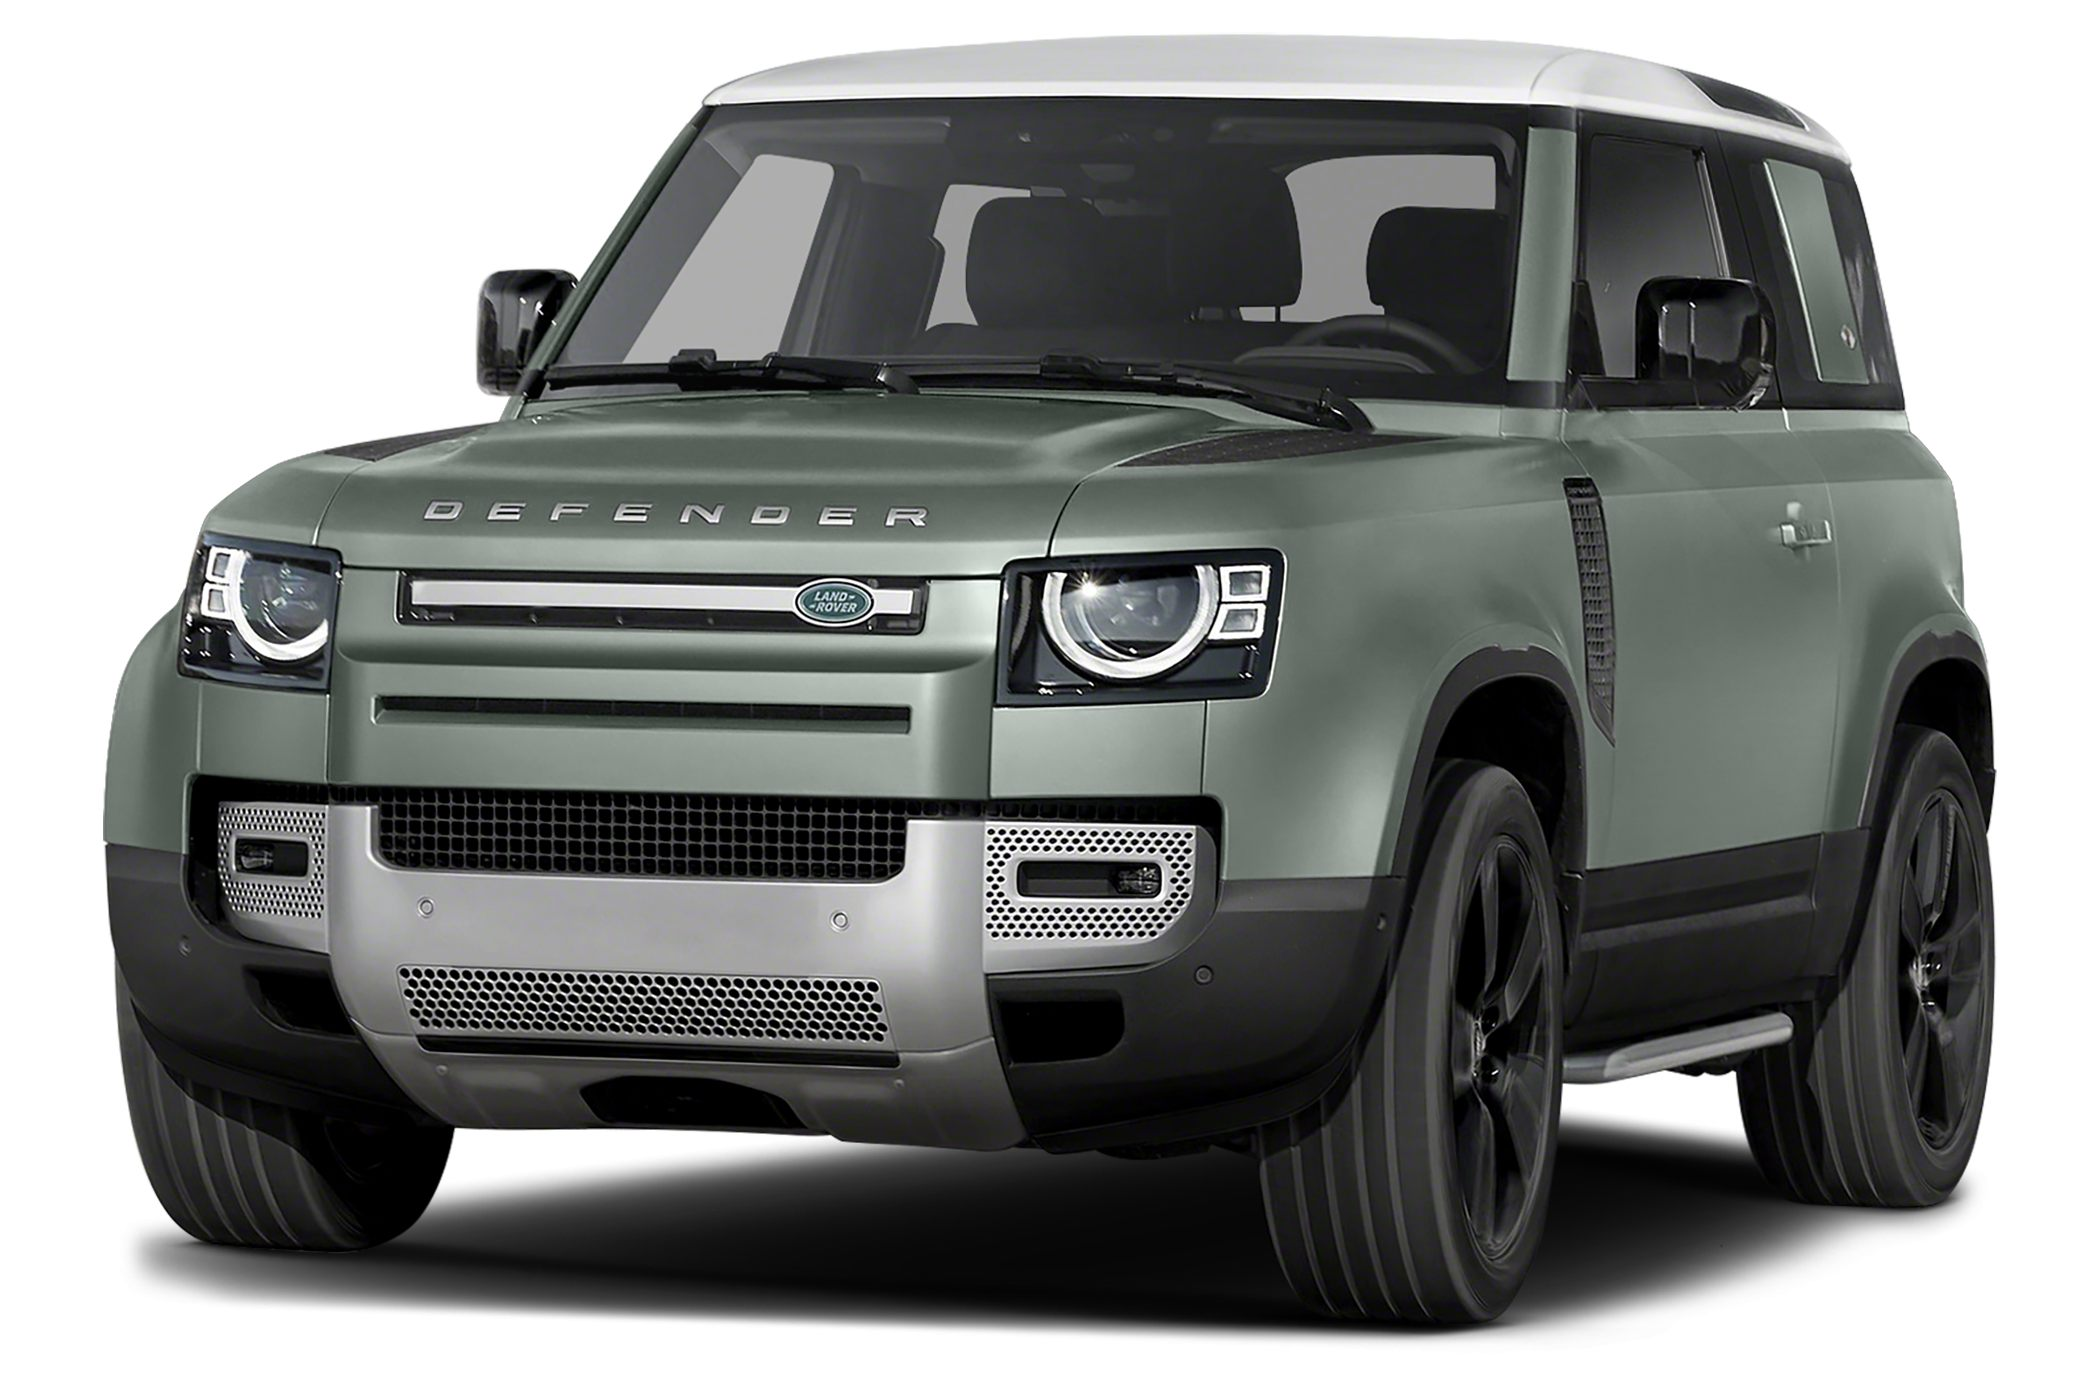 2022 Land Rover Defender Carpathian Edition 2dr 4x4 90 ...